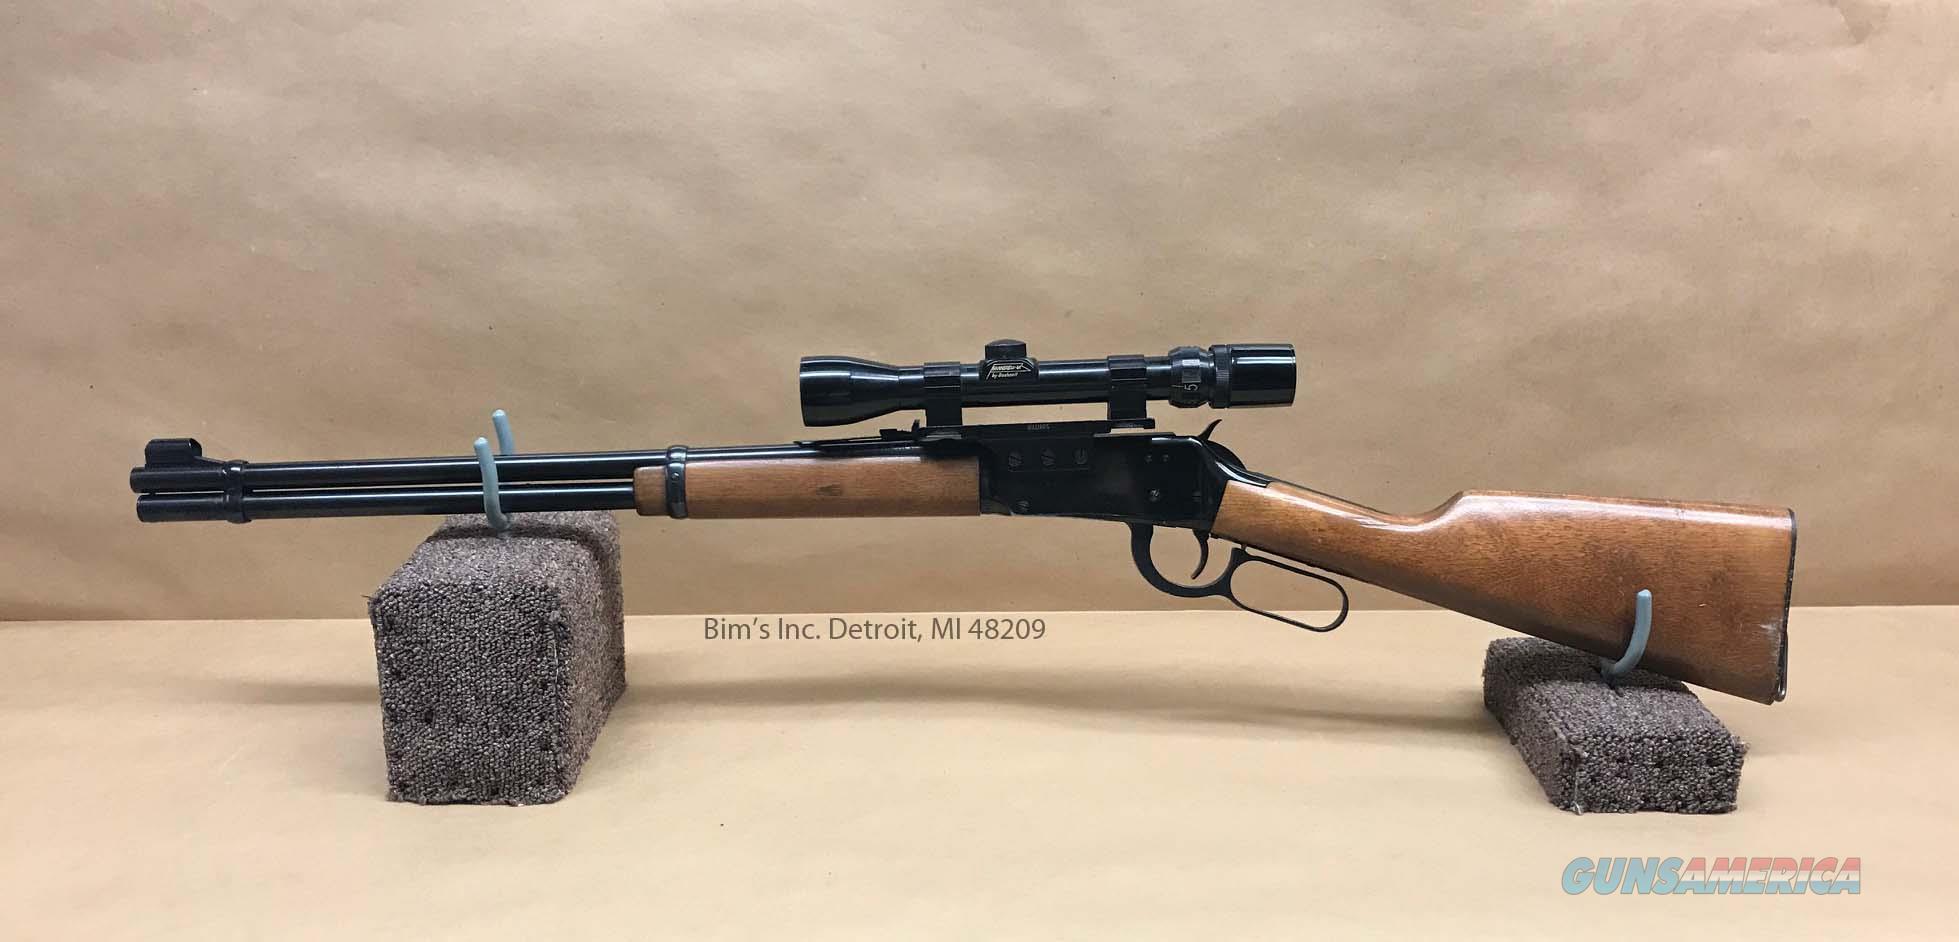 Winchester Model 94 30-30 w/ Bushnell 3x9 scope  Guns > Rifles > Winchester Rifles - Modern Lever > Model 94 > Post-64